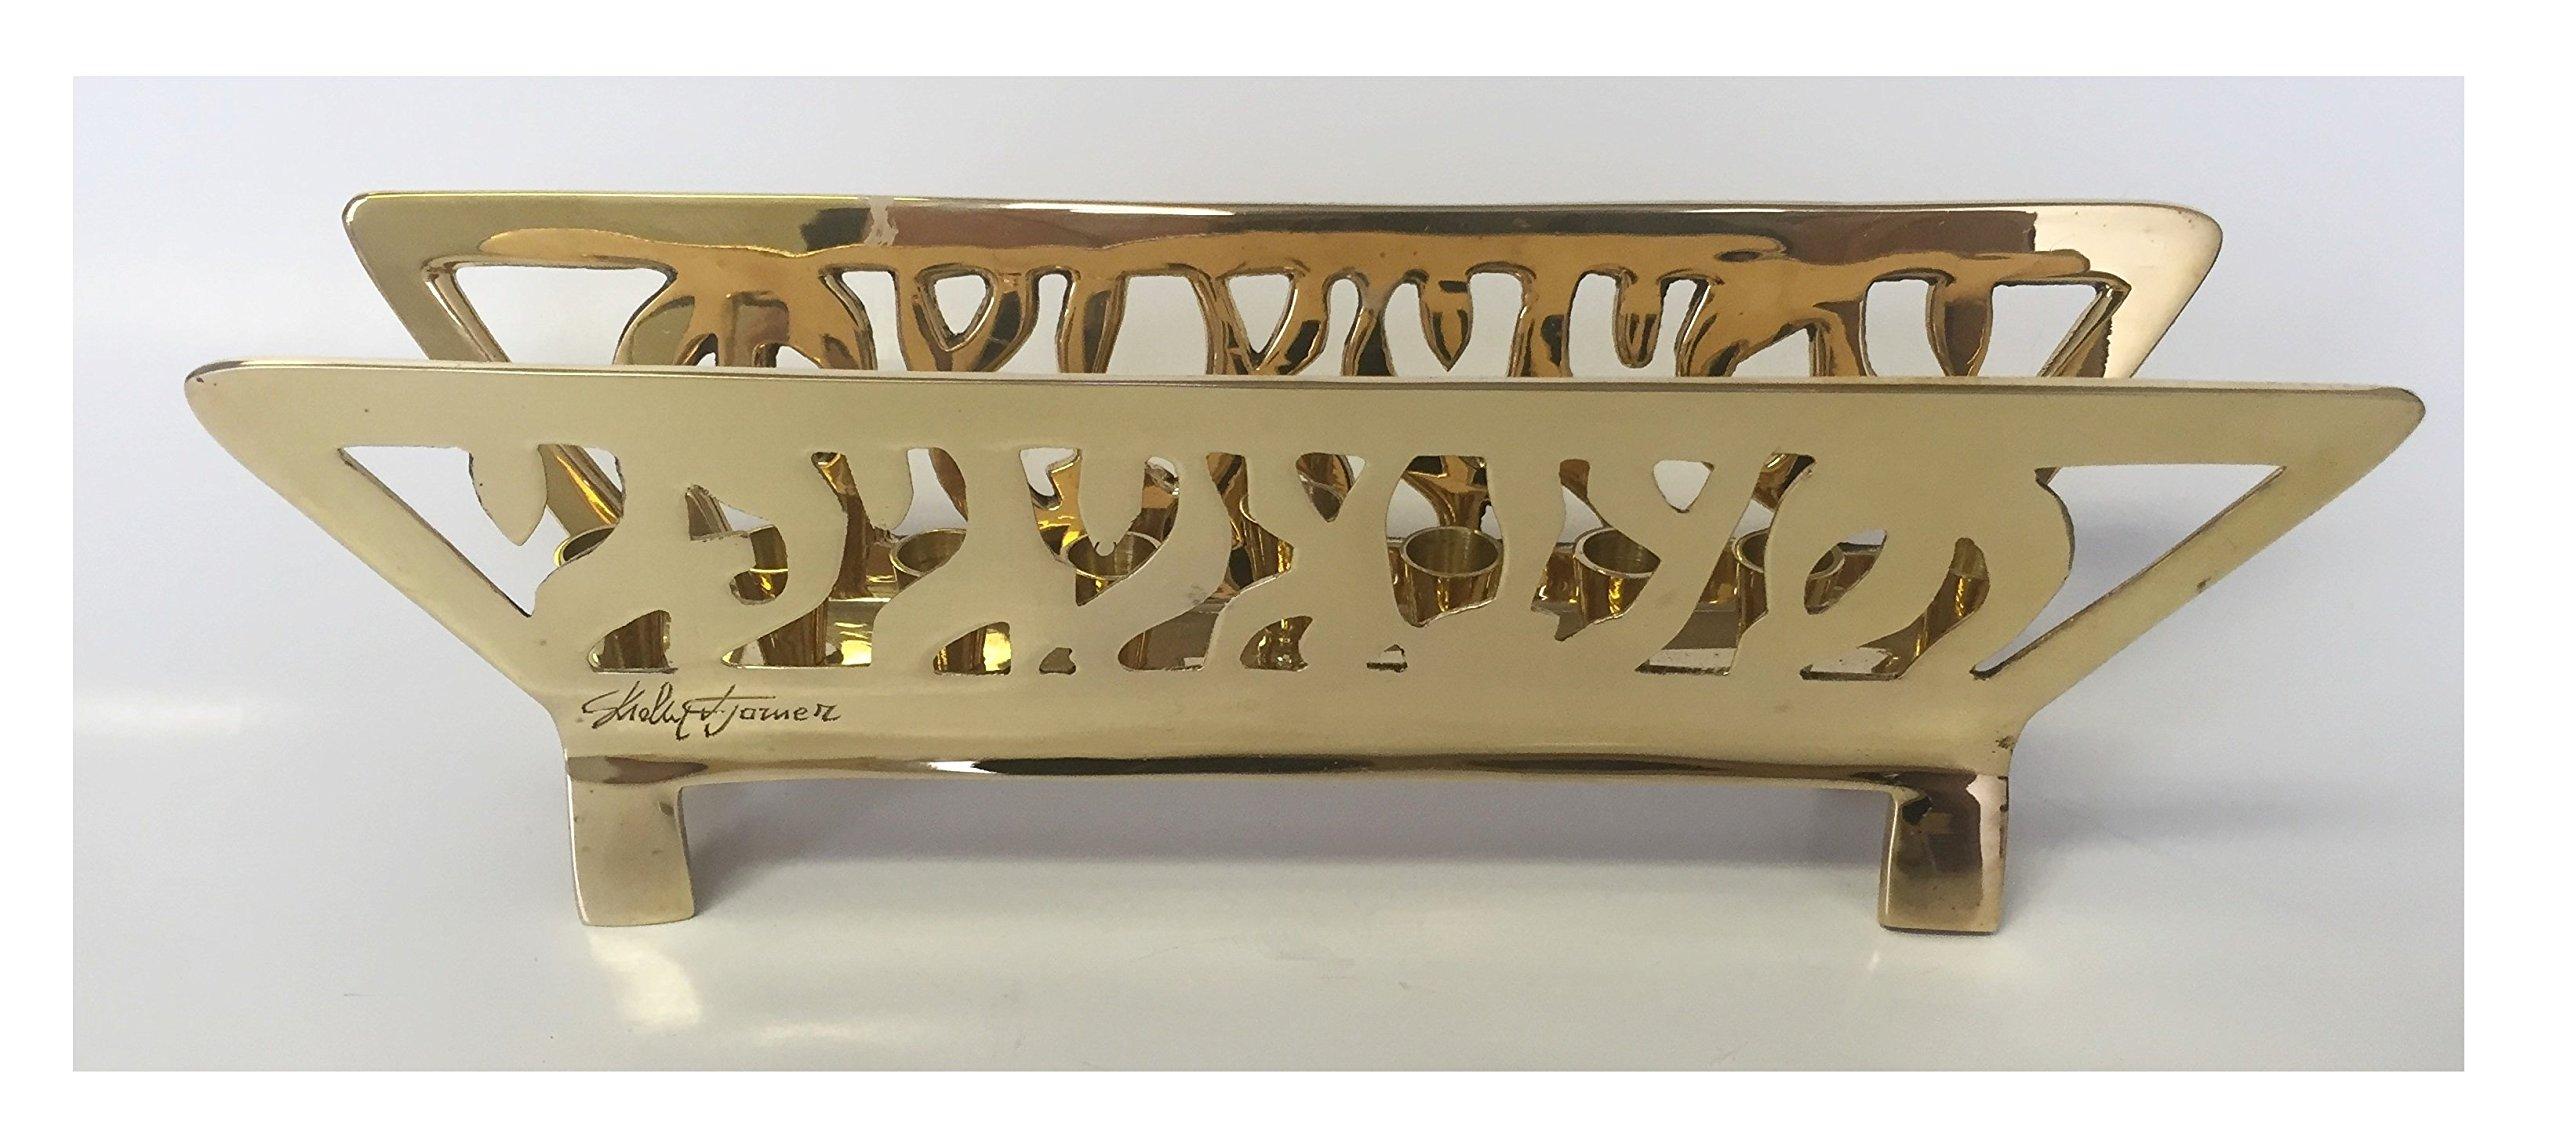 Alef Judaica Brass Hanukkah Menorah - Flamed Cut Out Design. Comes Velvet Boxed by Alef Judaica